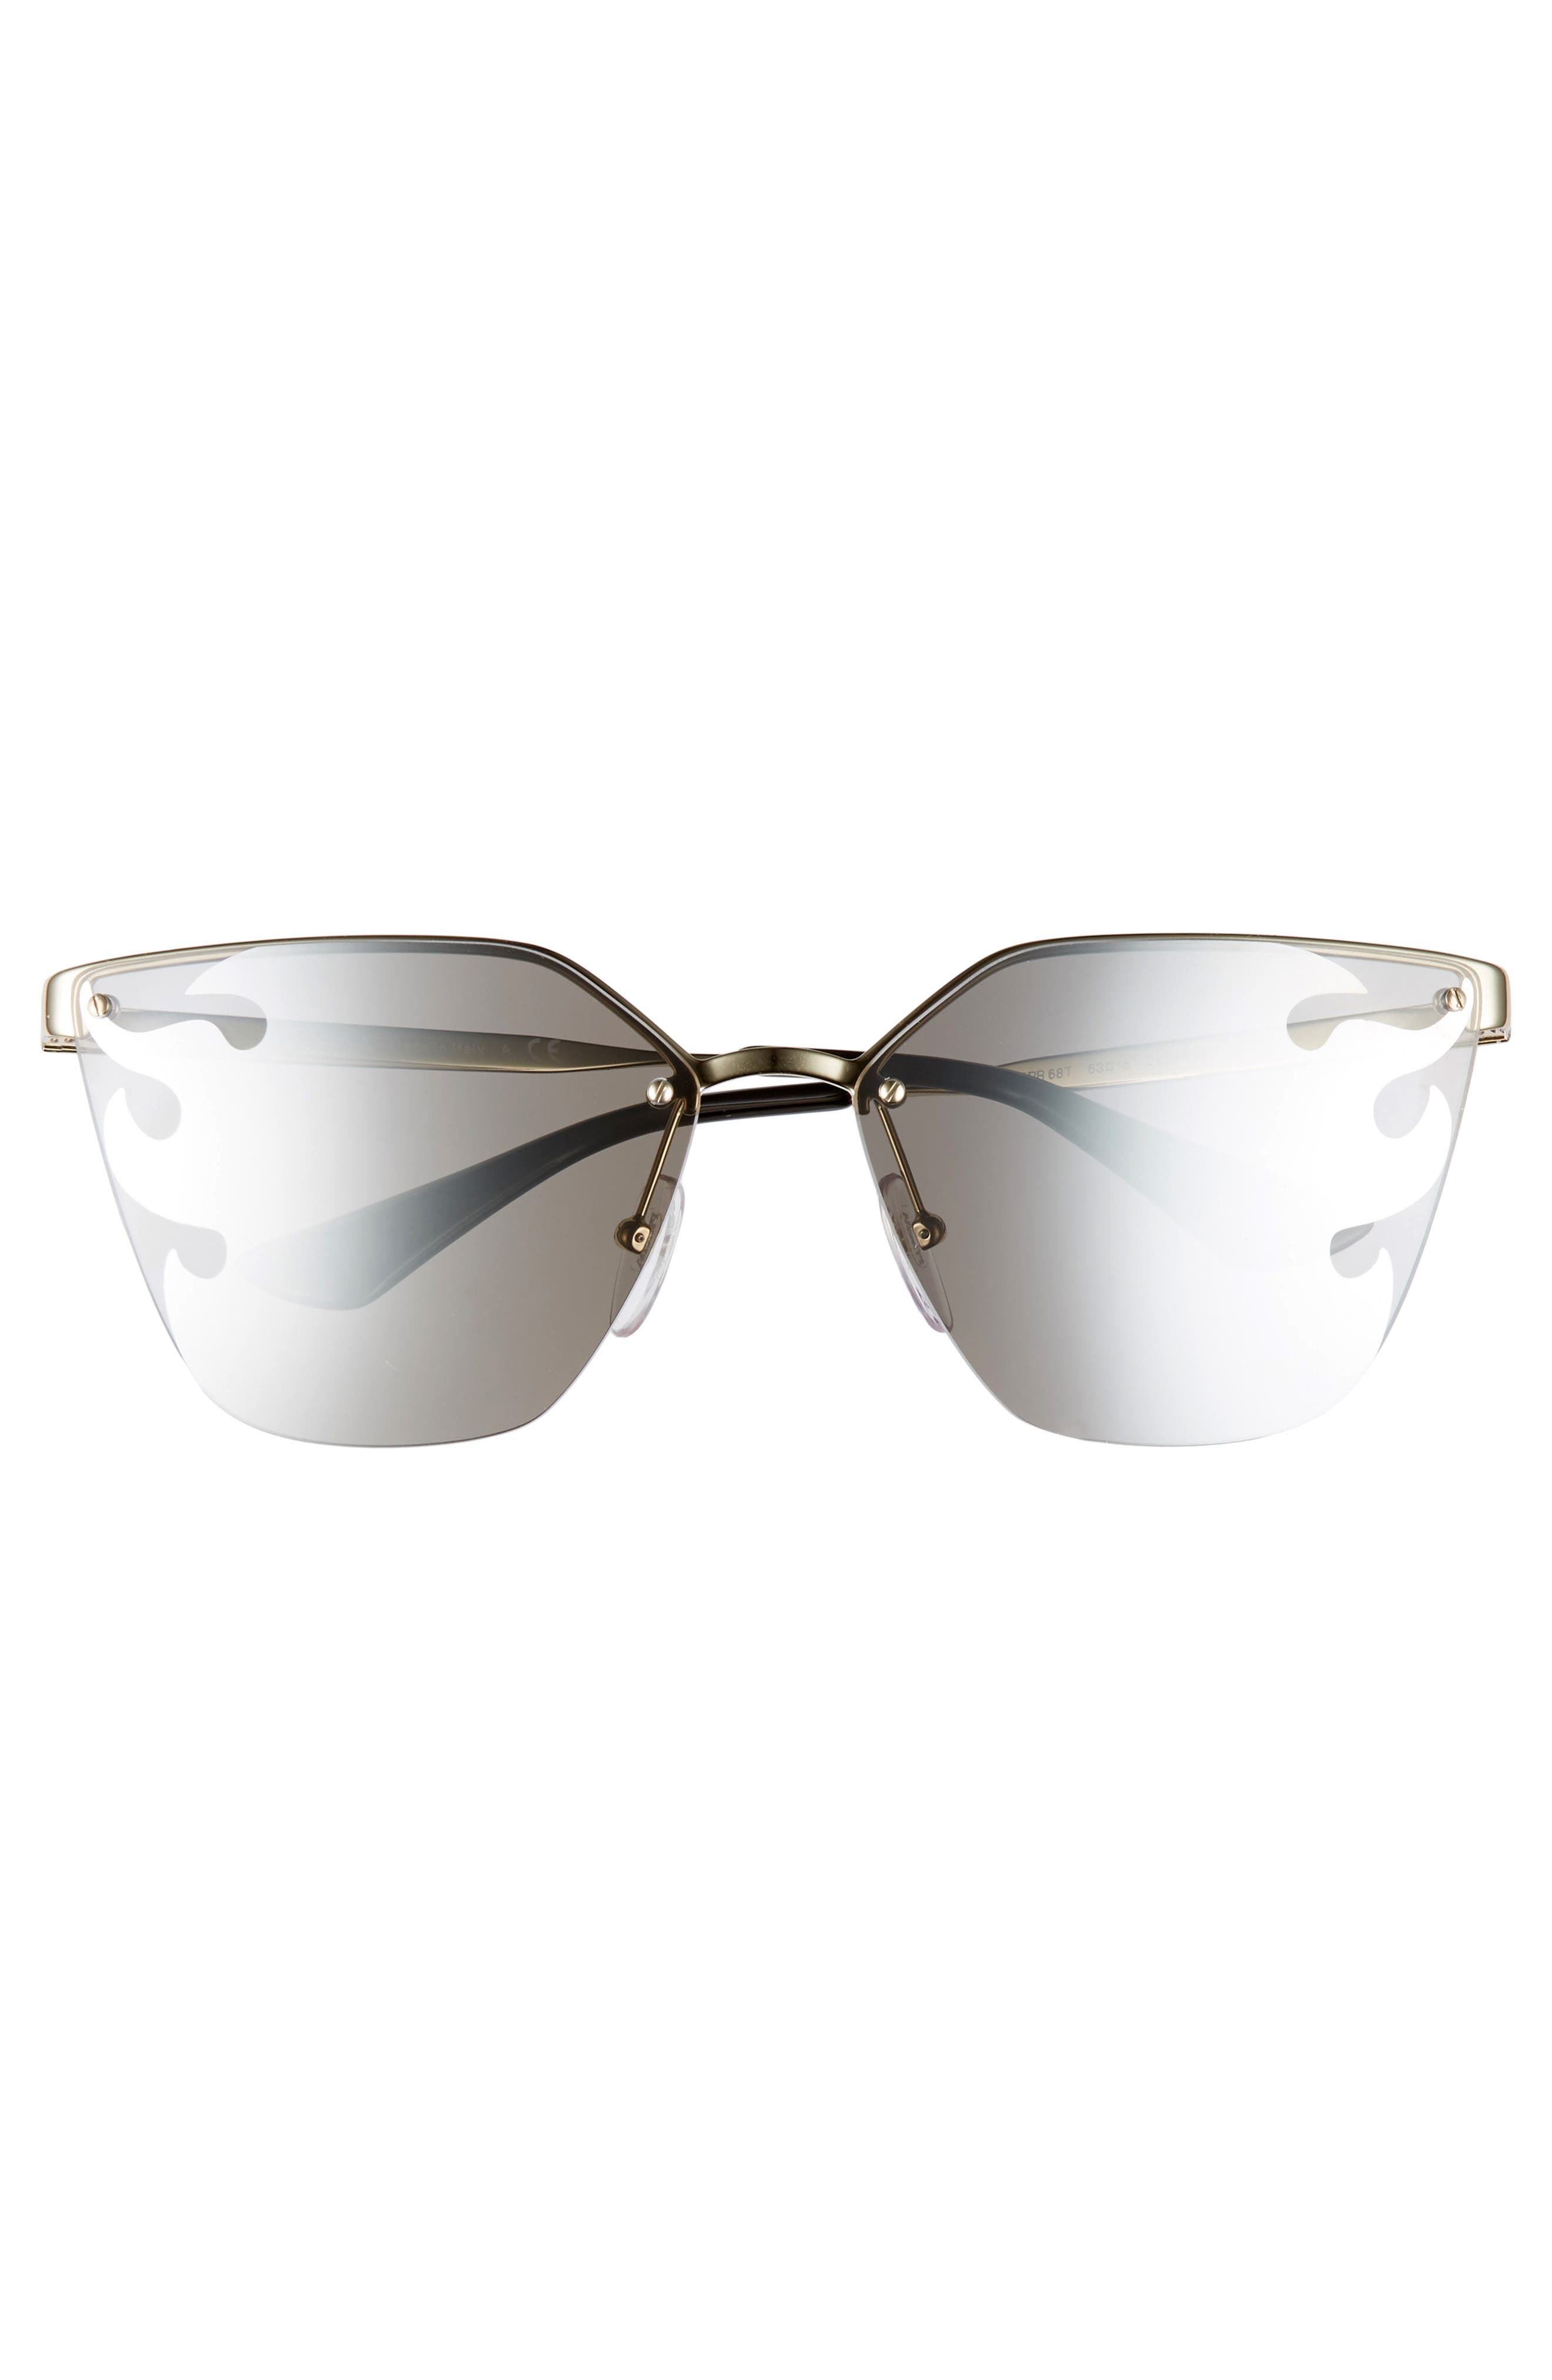 PRADA,                             Cinéma 63mm Oversize Rimless Sunglasses,                             Alternate thumbnail 3, color,                             GOLD/ GREY SILVER MIRROR